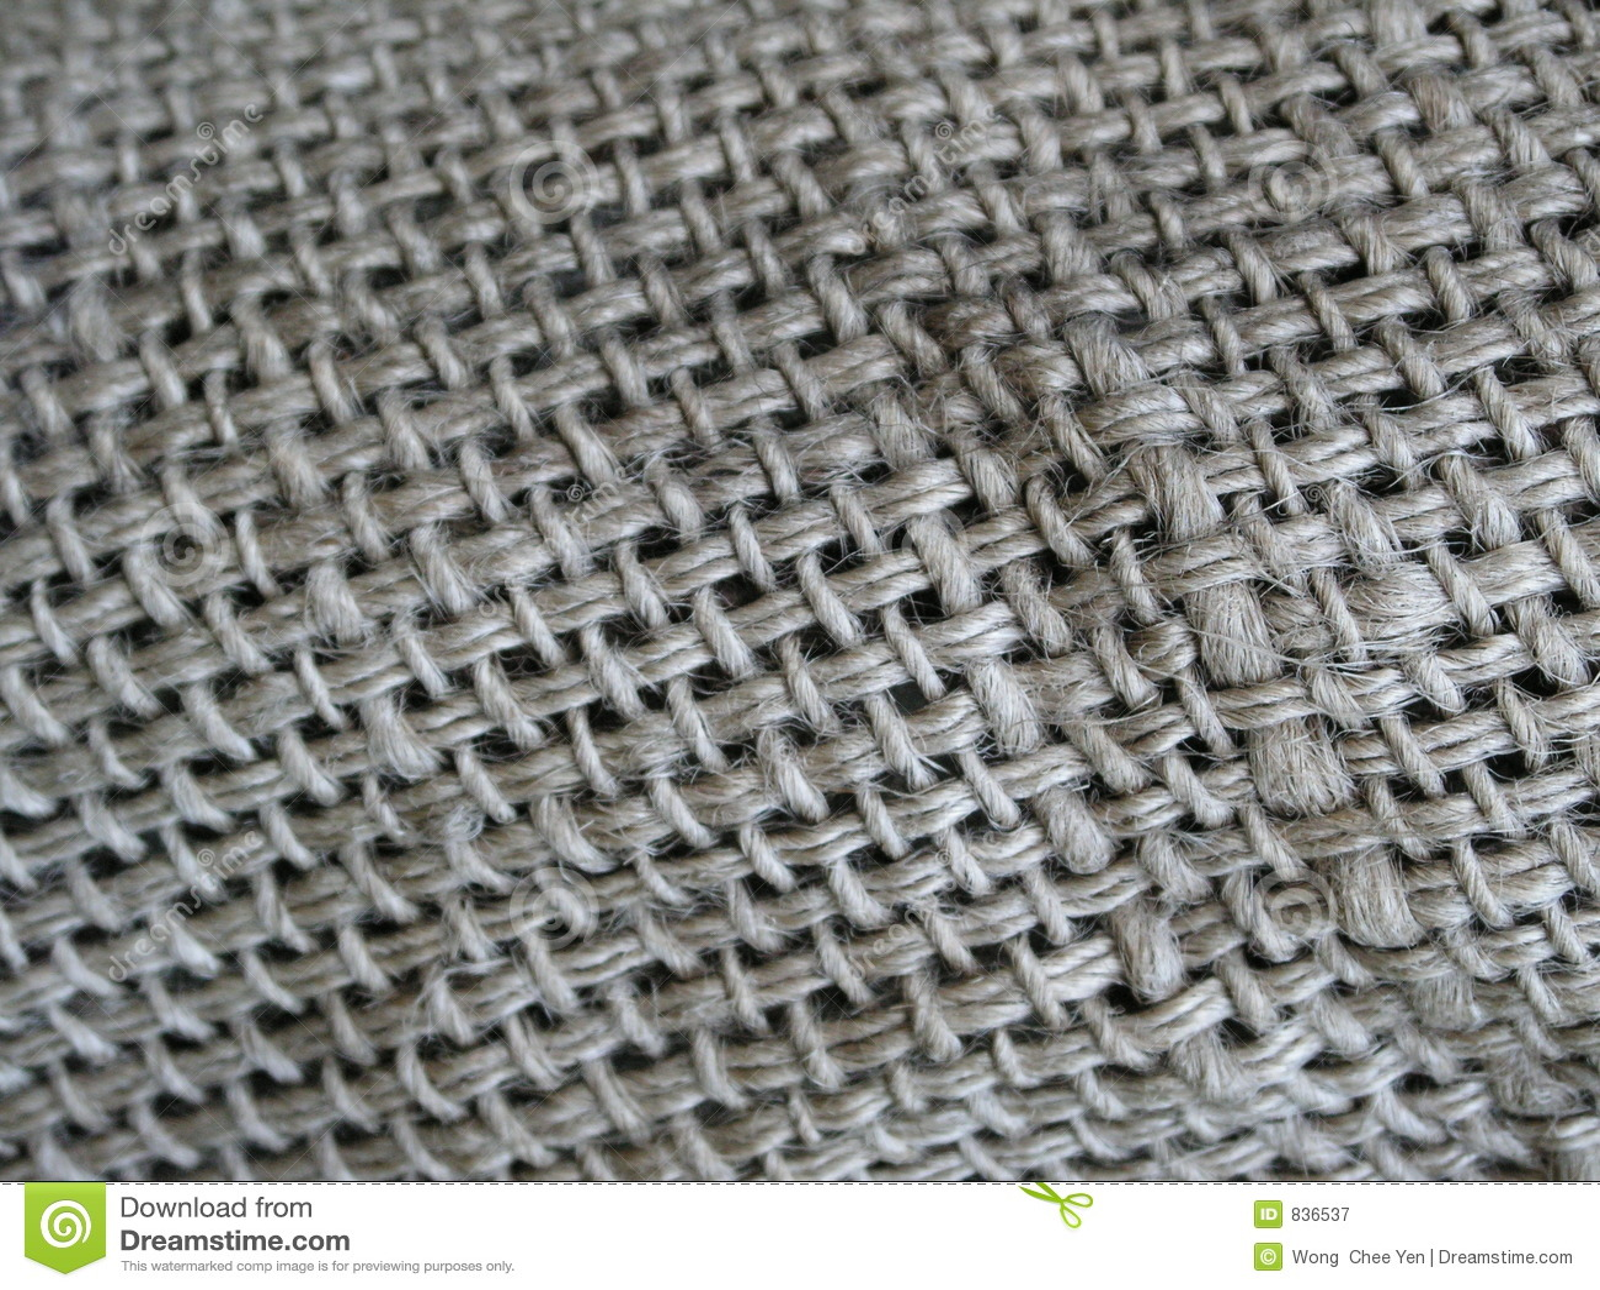 Old sack cloth